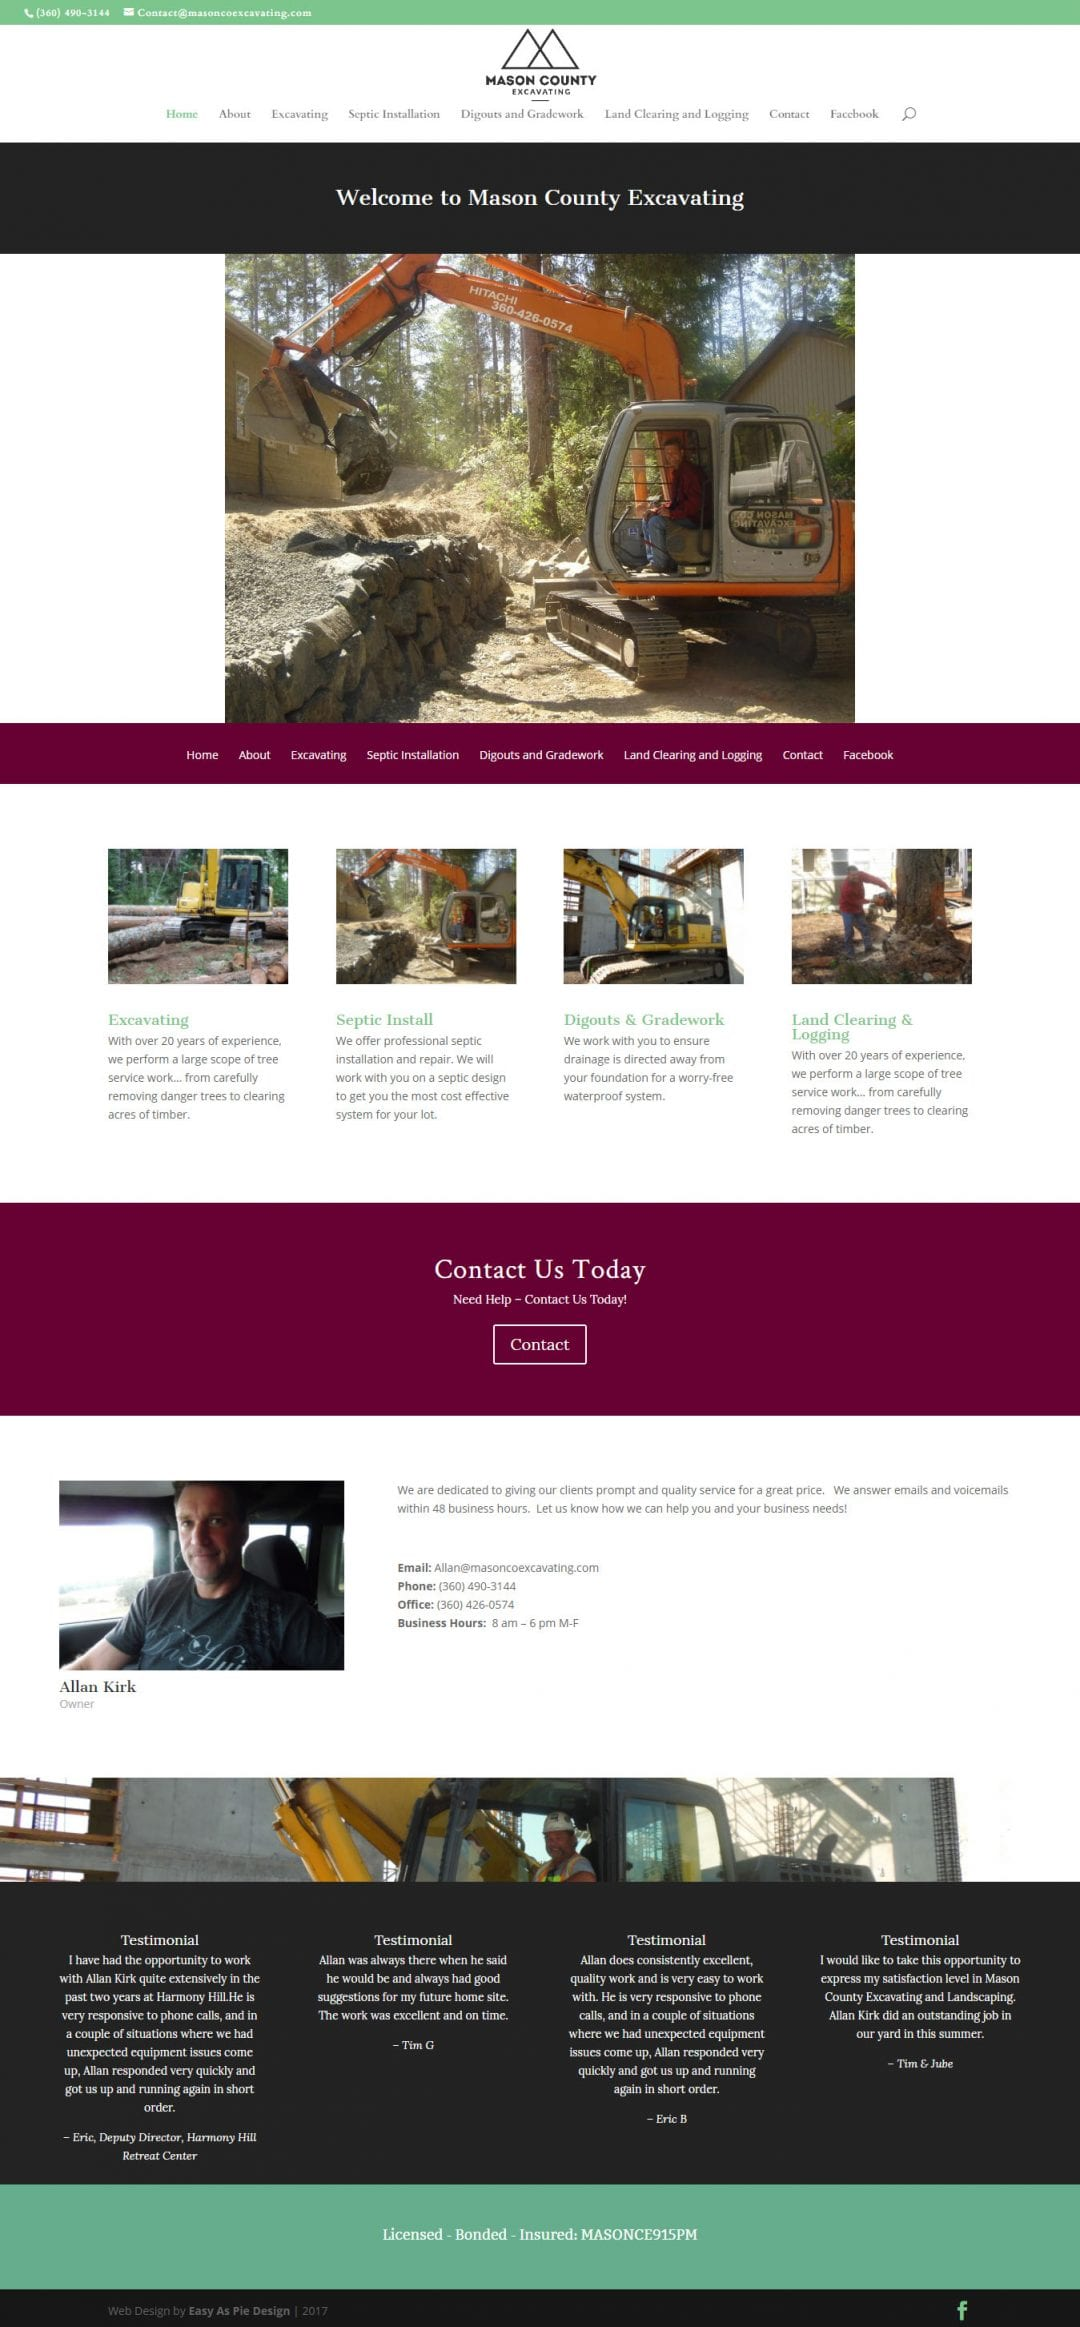 Mason County Excavating